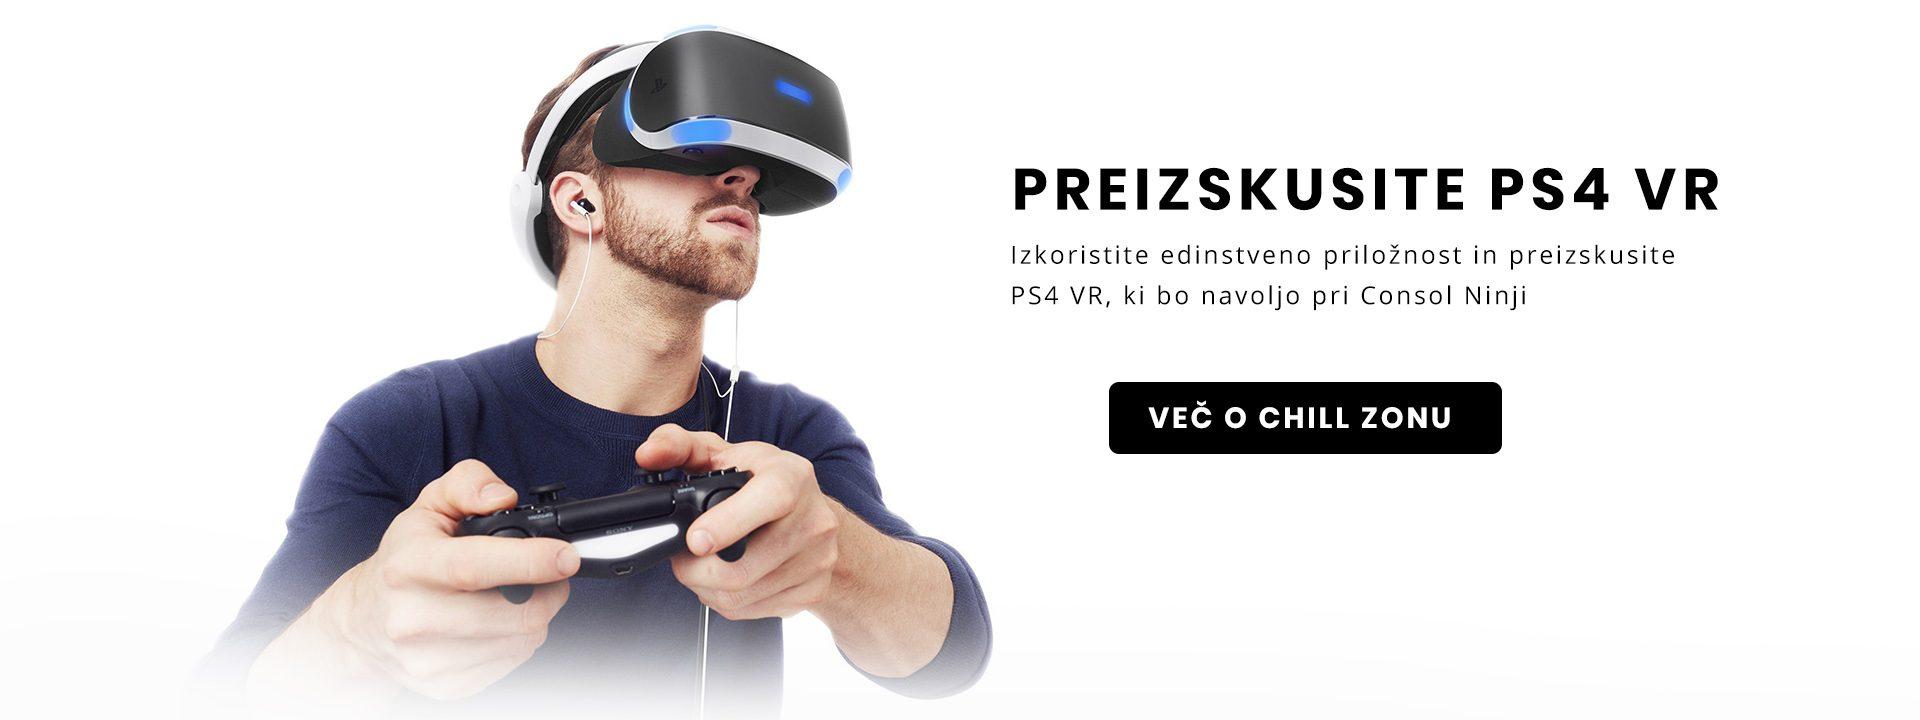 Testiraj PS4 VR na StarFallu